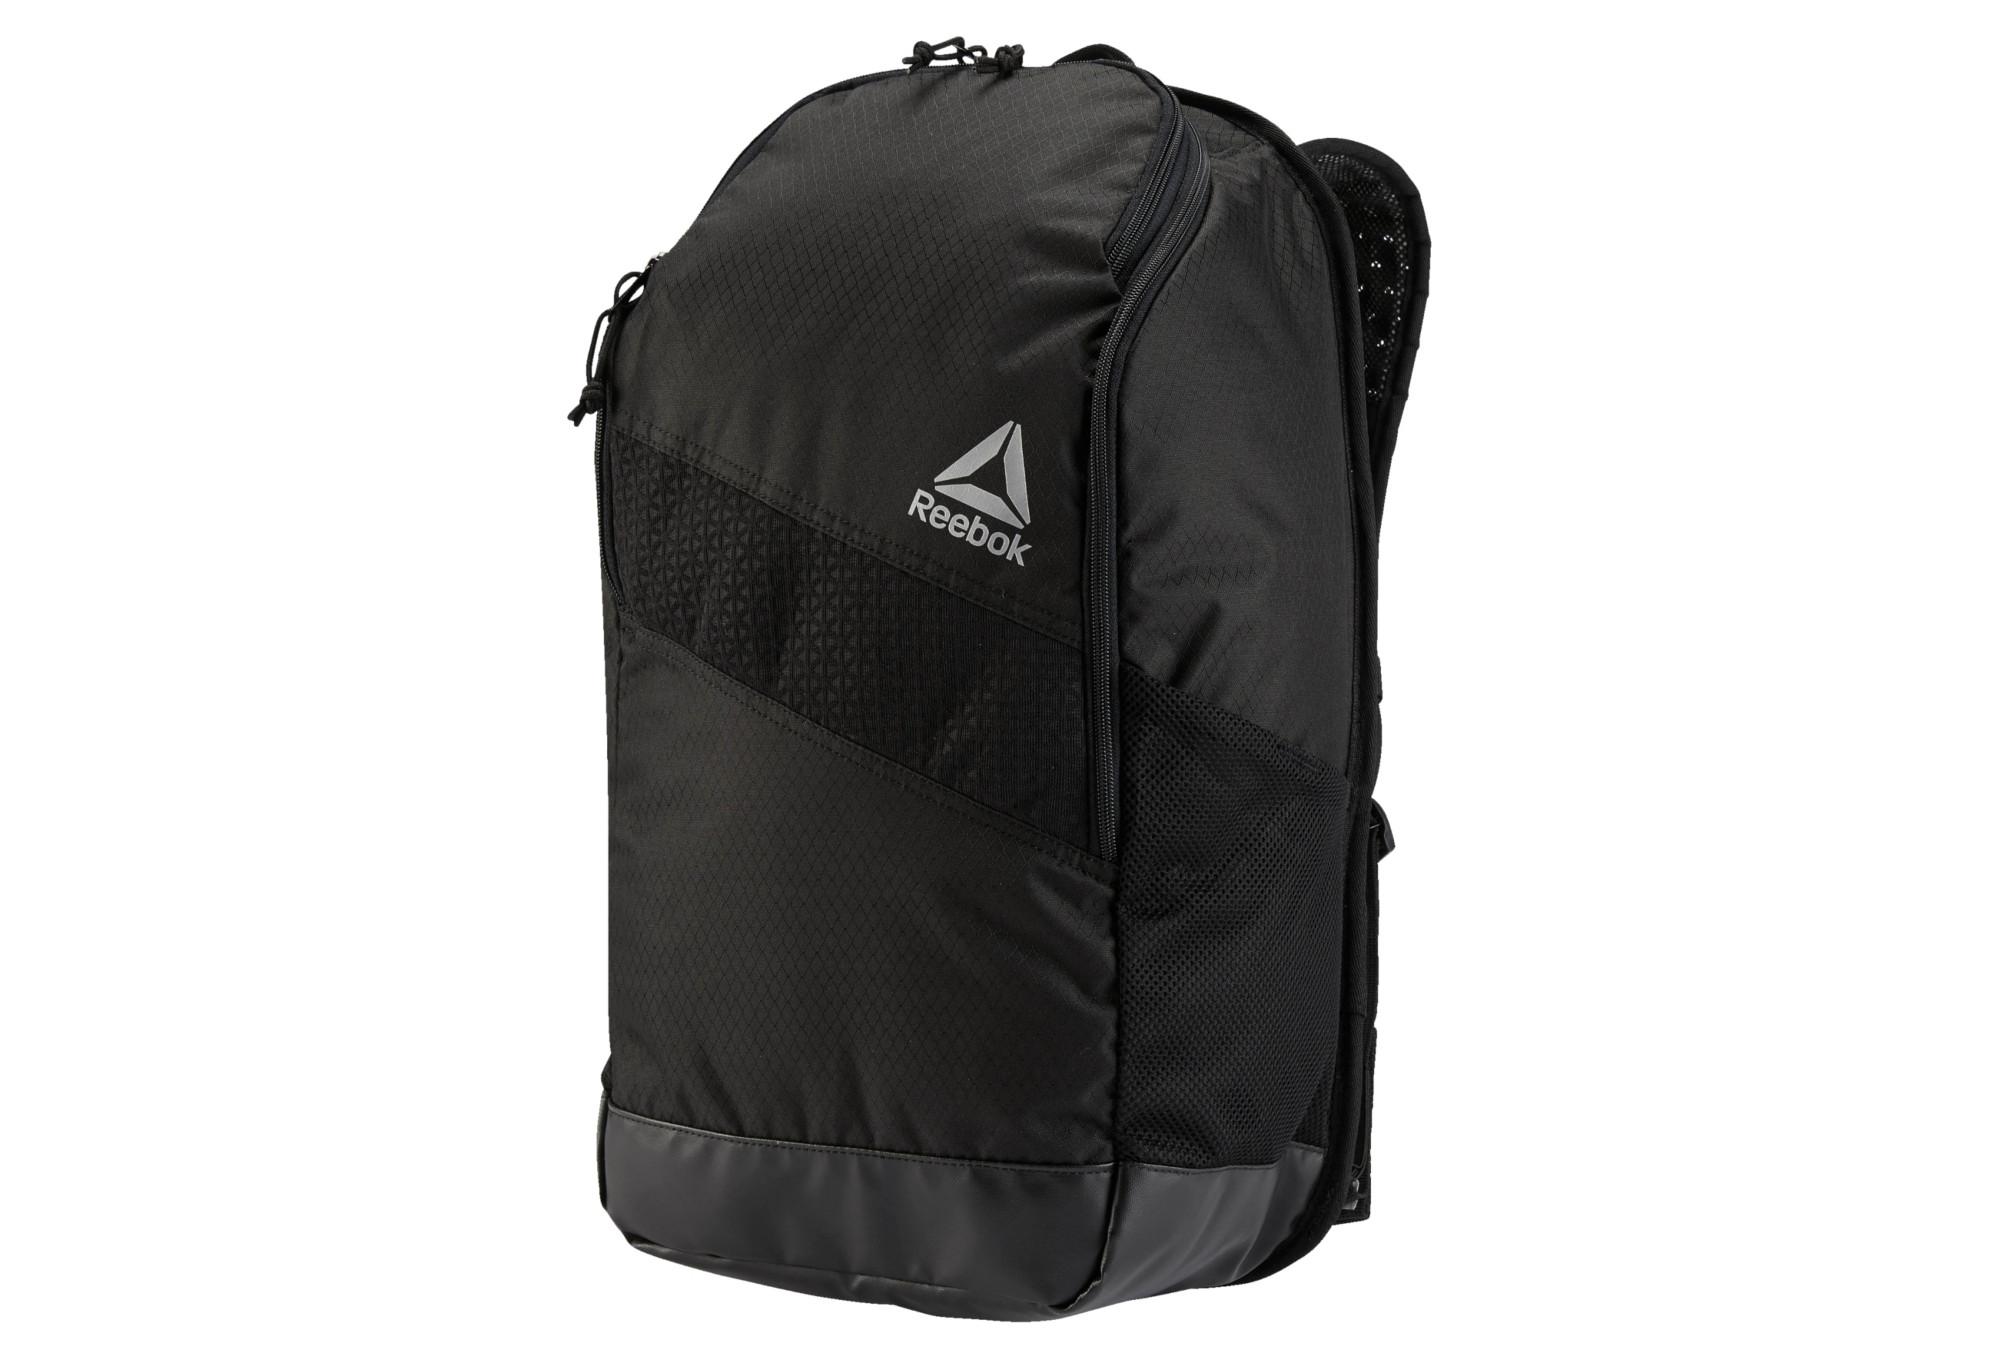 Reebok Backpack 24L Black